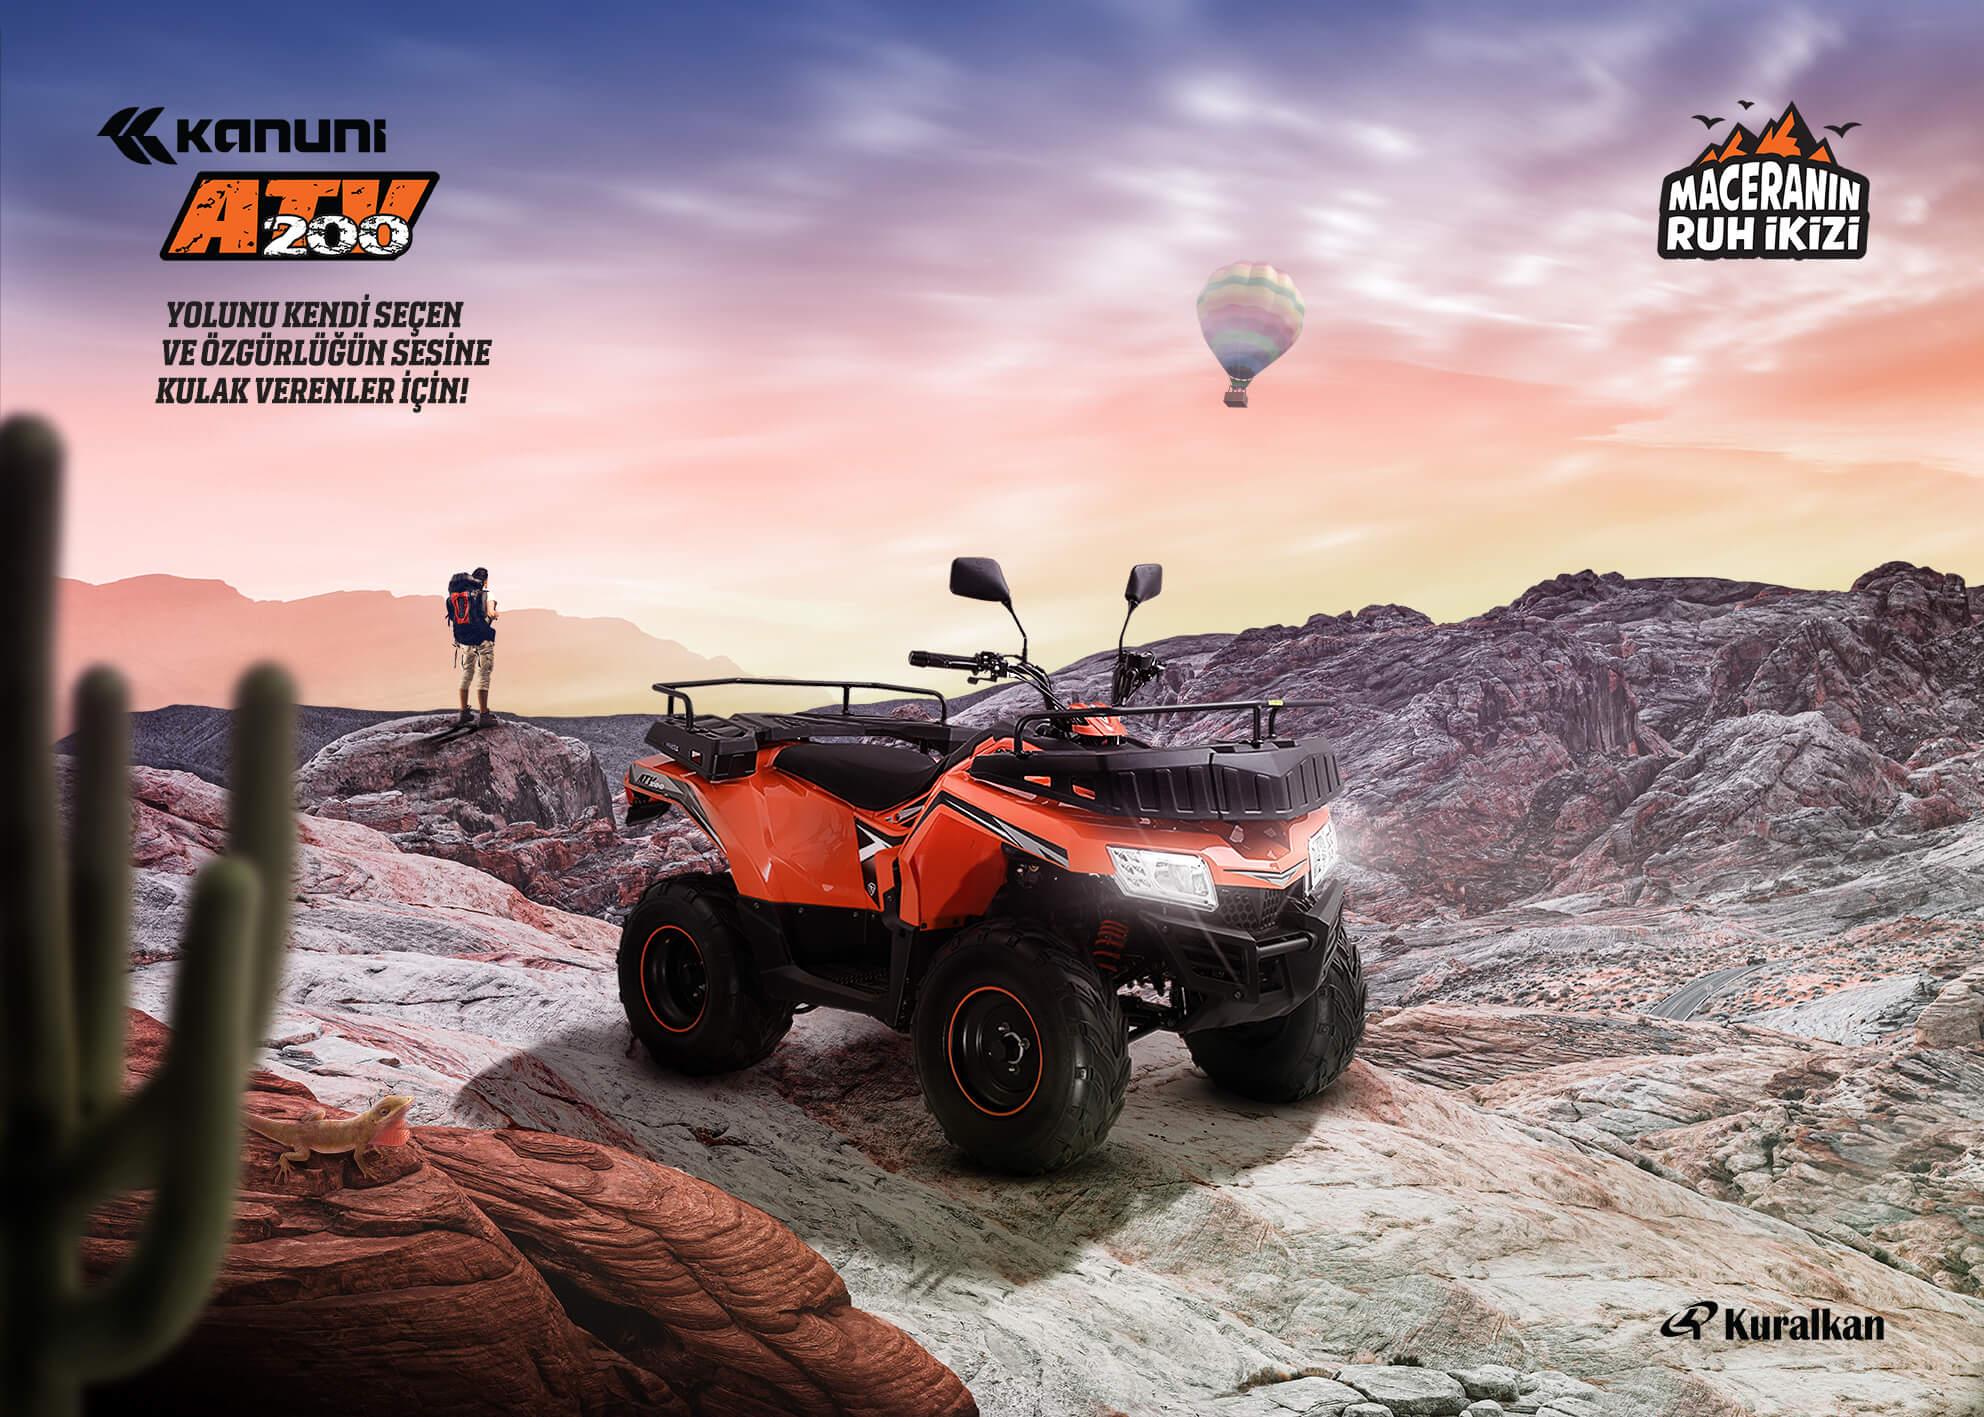 Kanuni ATV 200 KeyVisual 2021